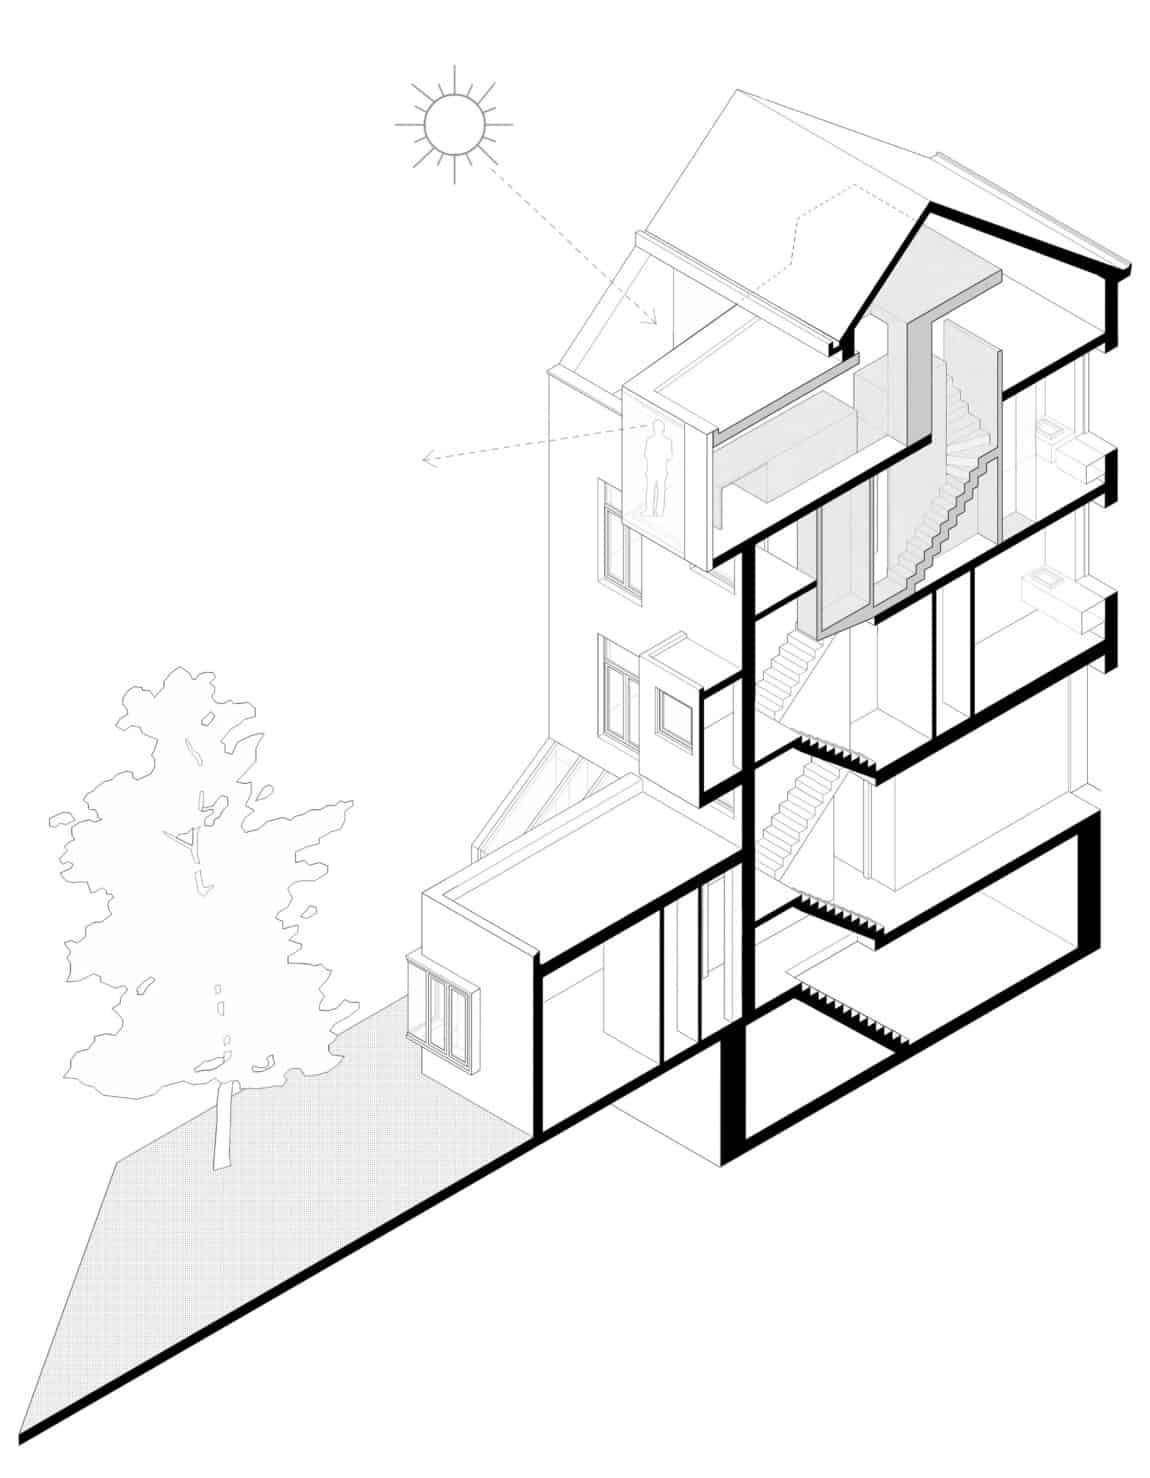 Home in Schaerbeek by Martens/Brunet Architects (25)